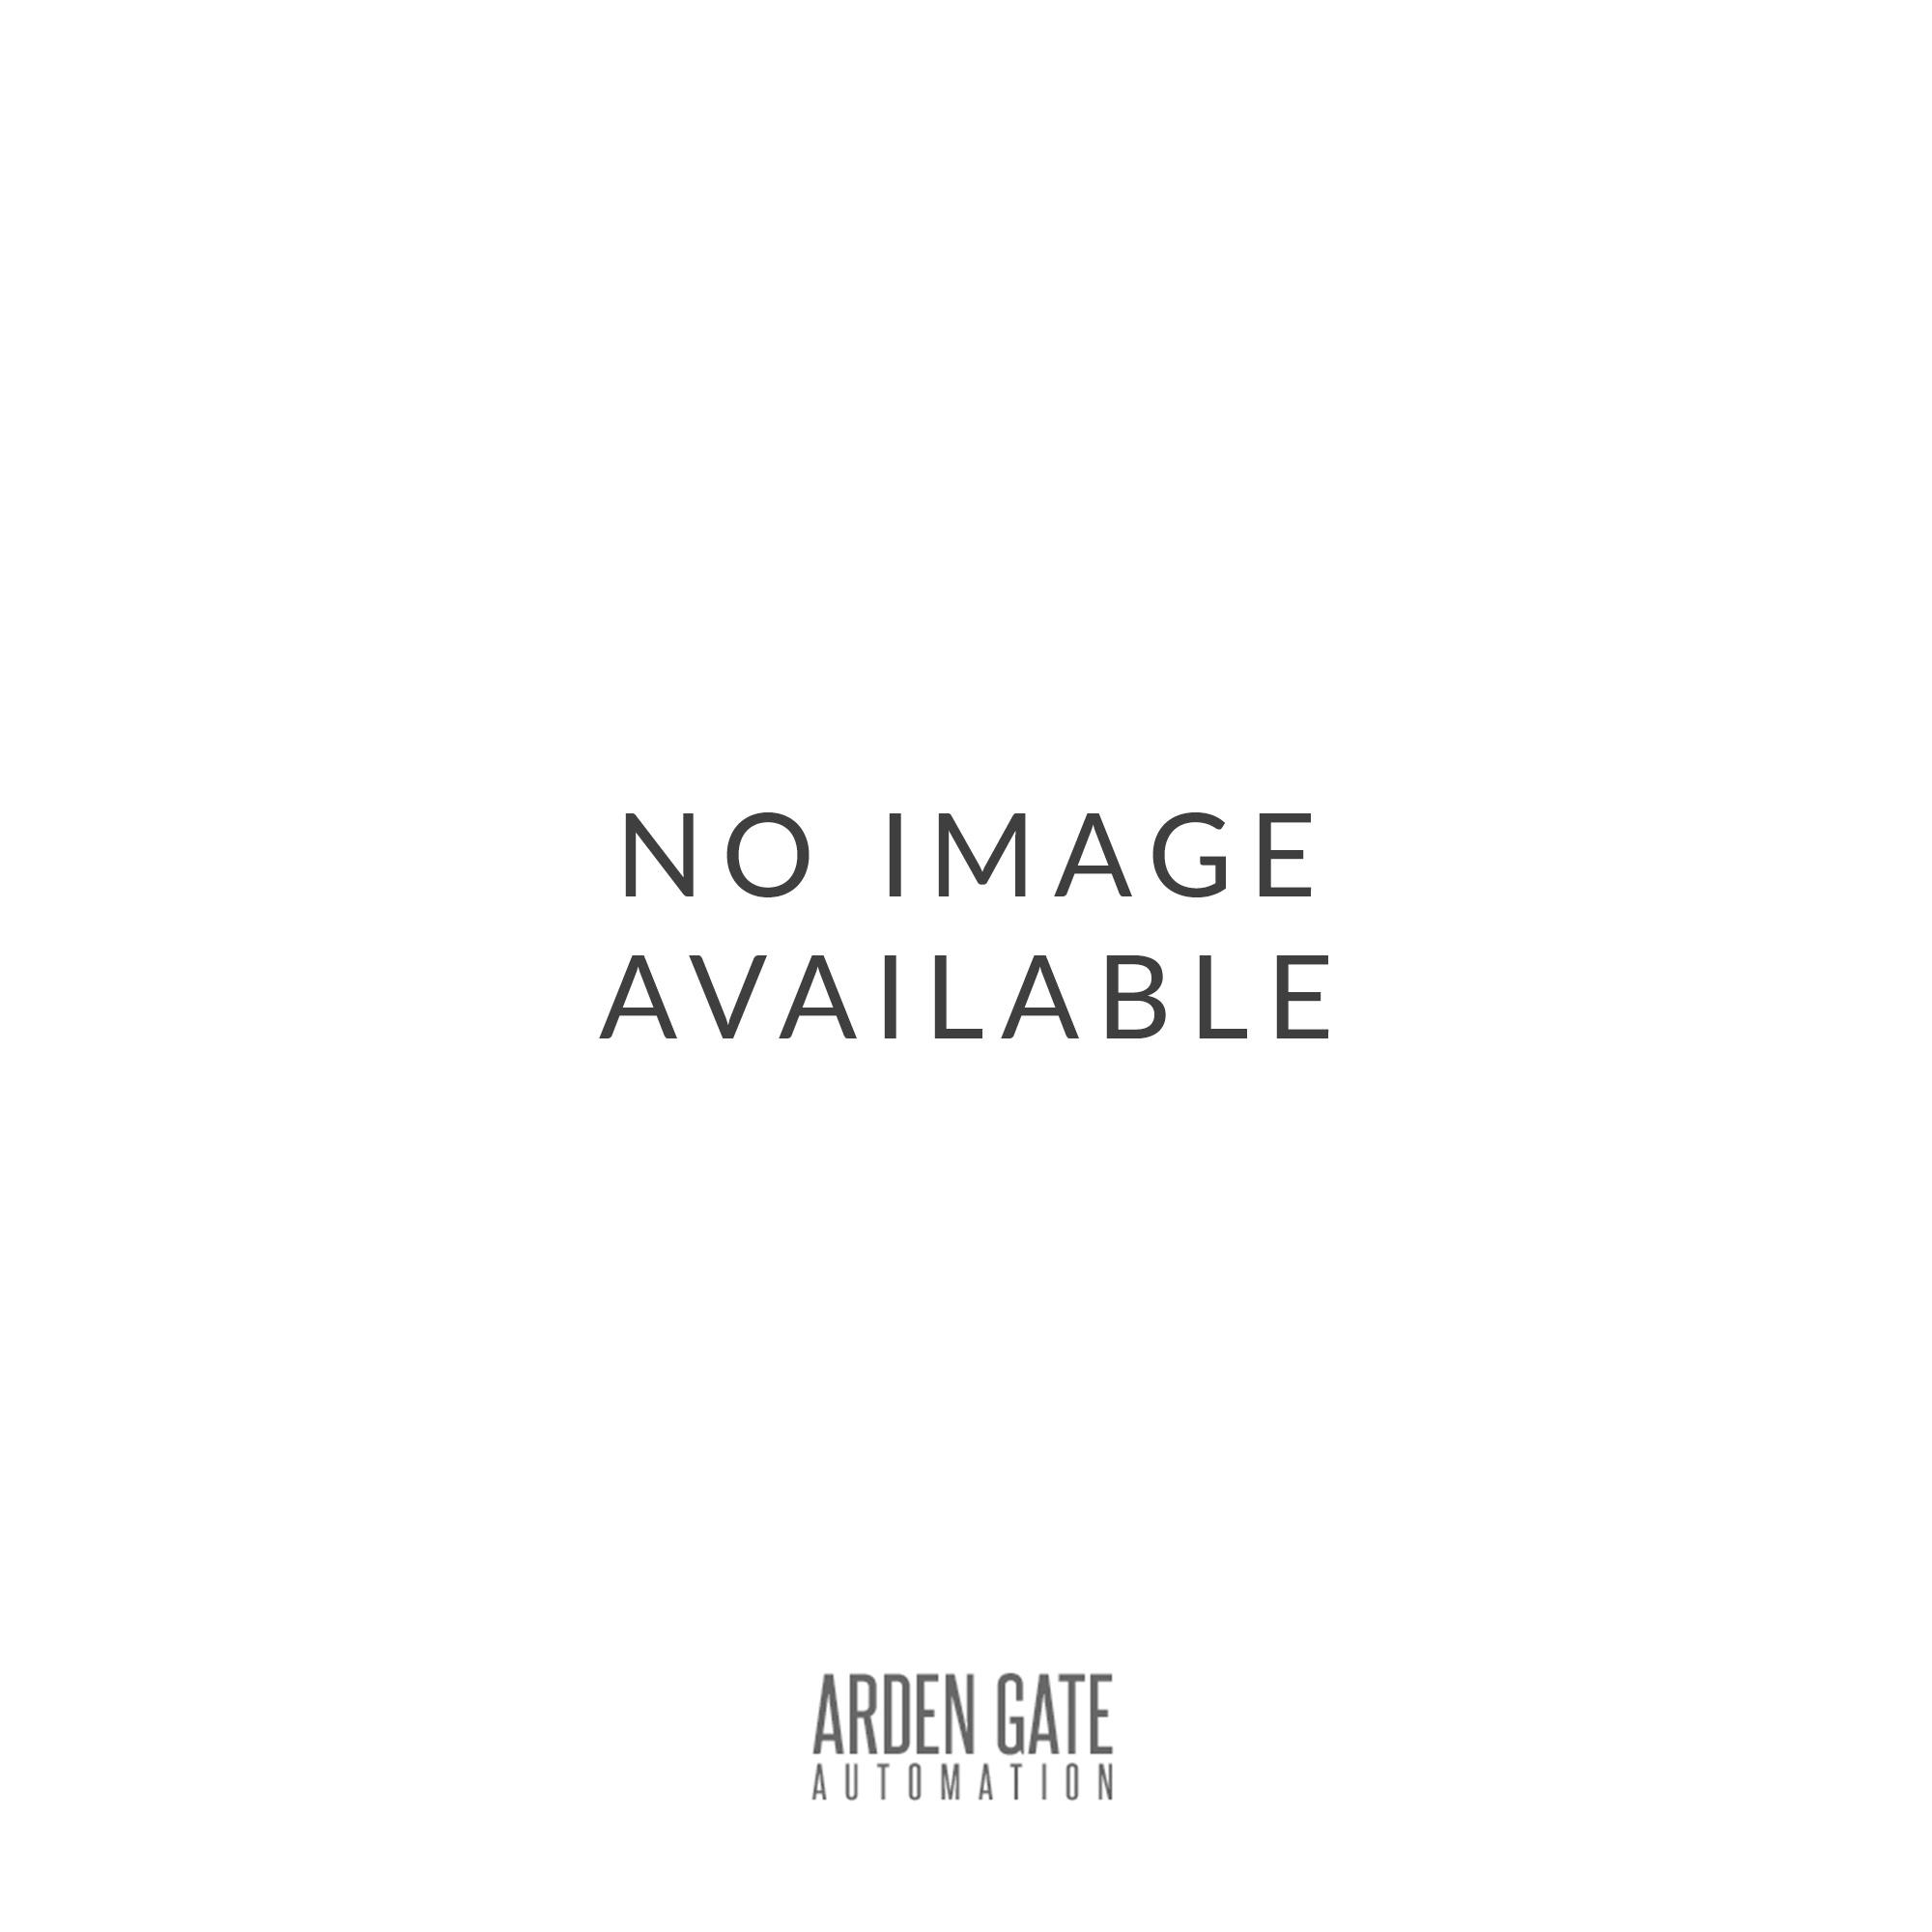 Telguard TelPad Modular Keypad